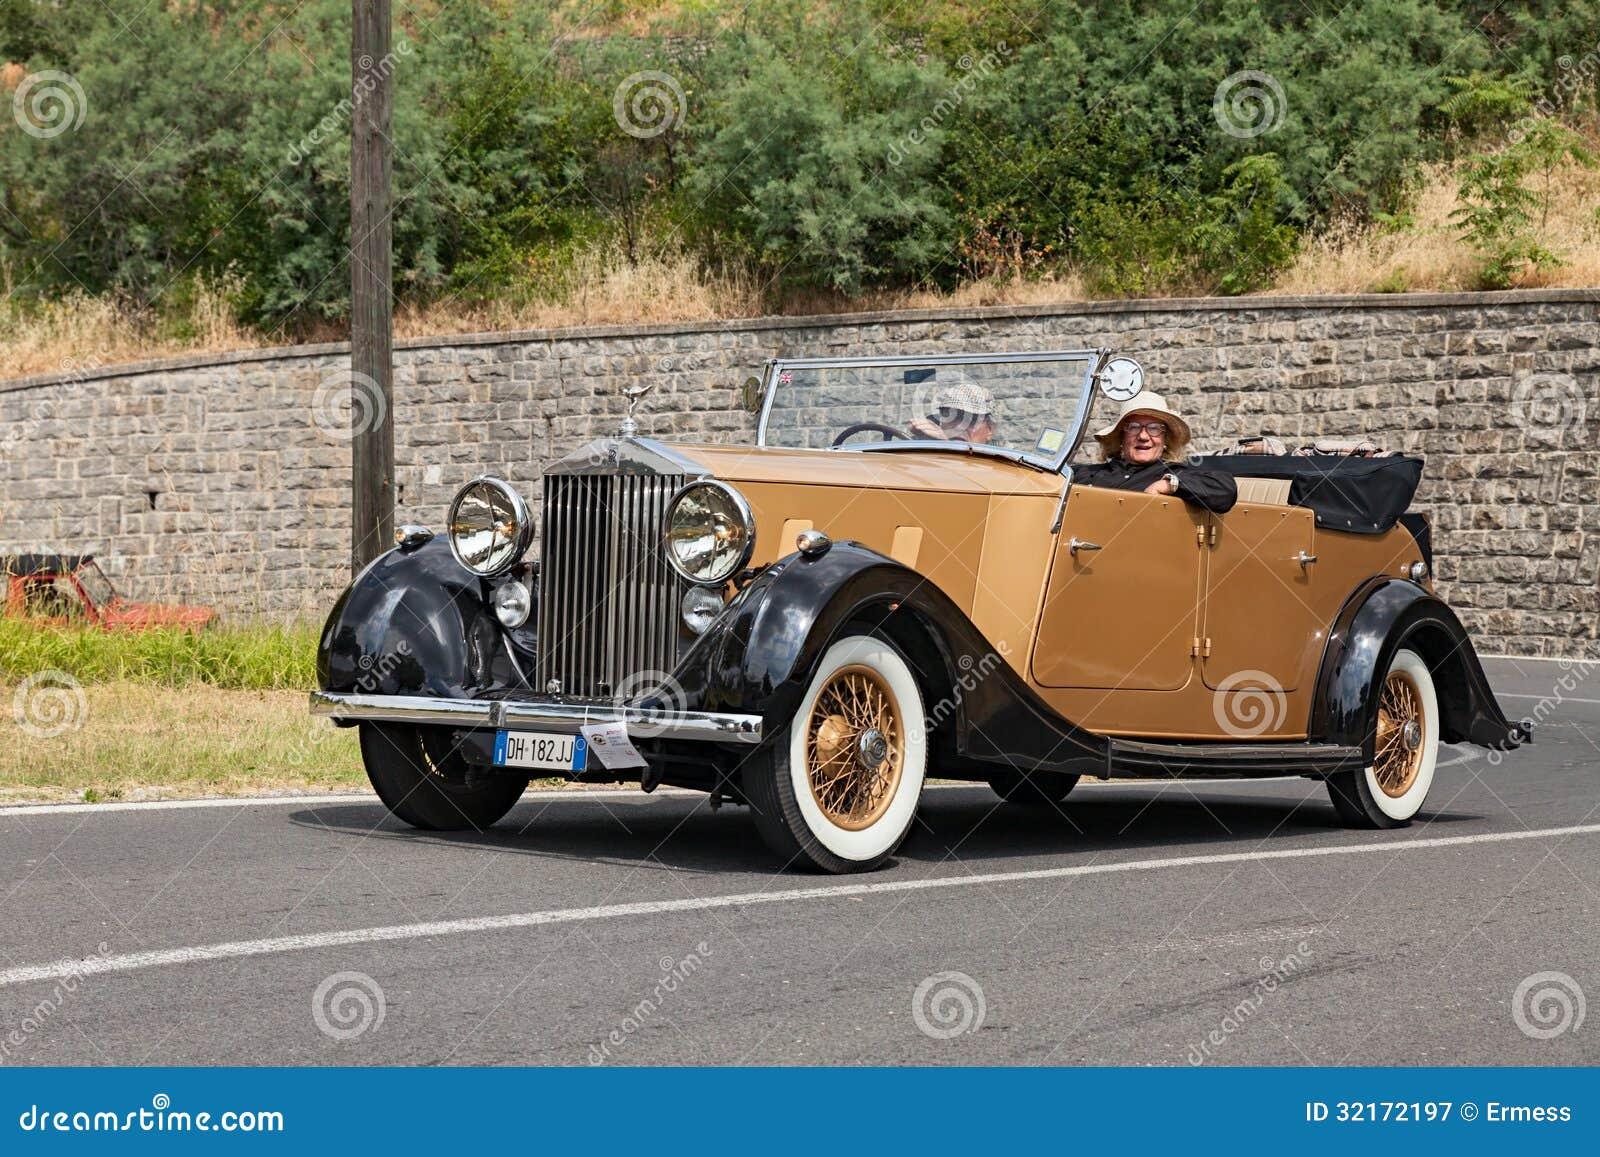 Vieille voiture rolls royce photographie ditorial image - Image de vieille voiture ...